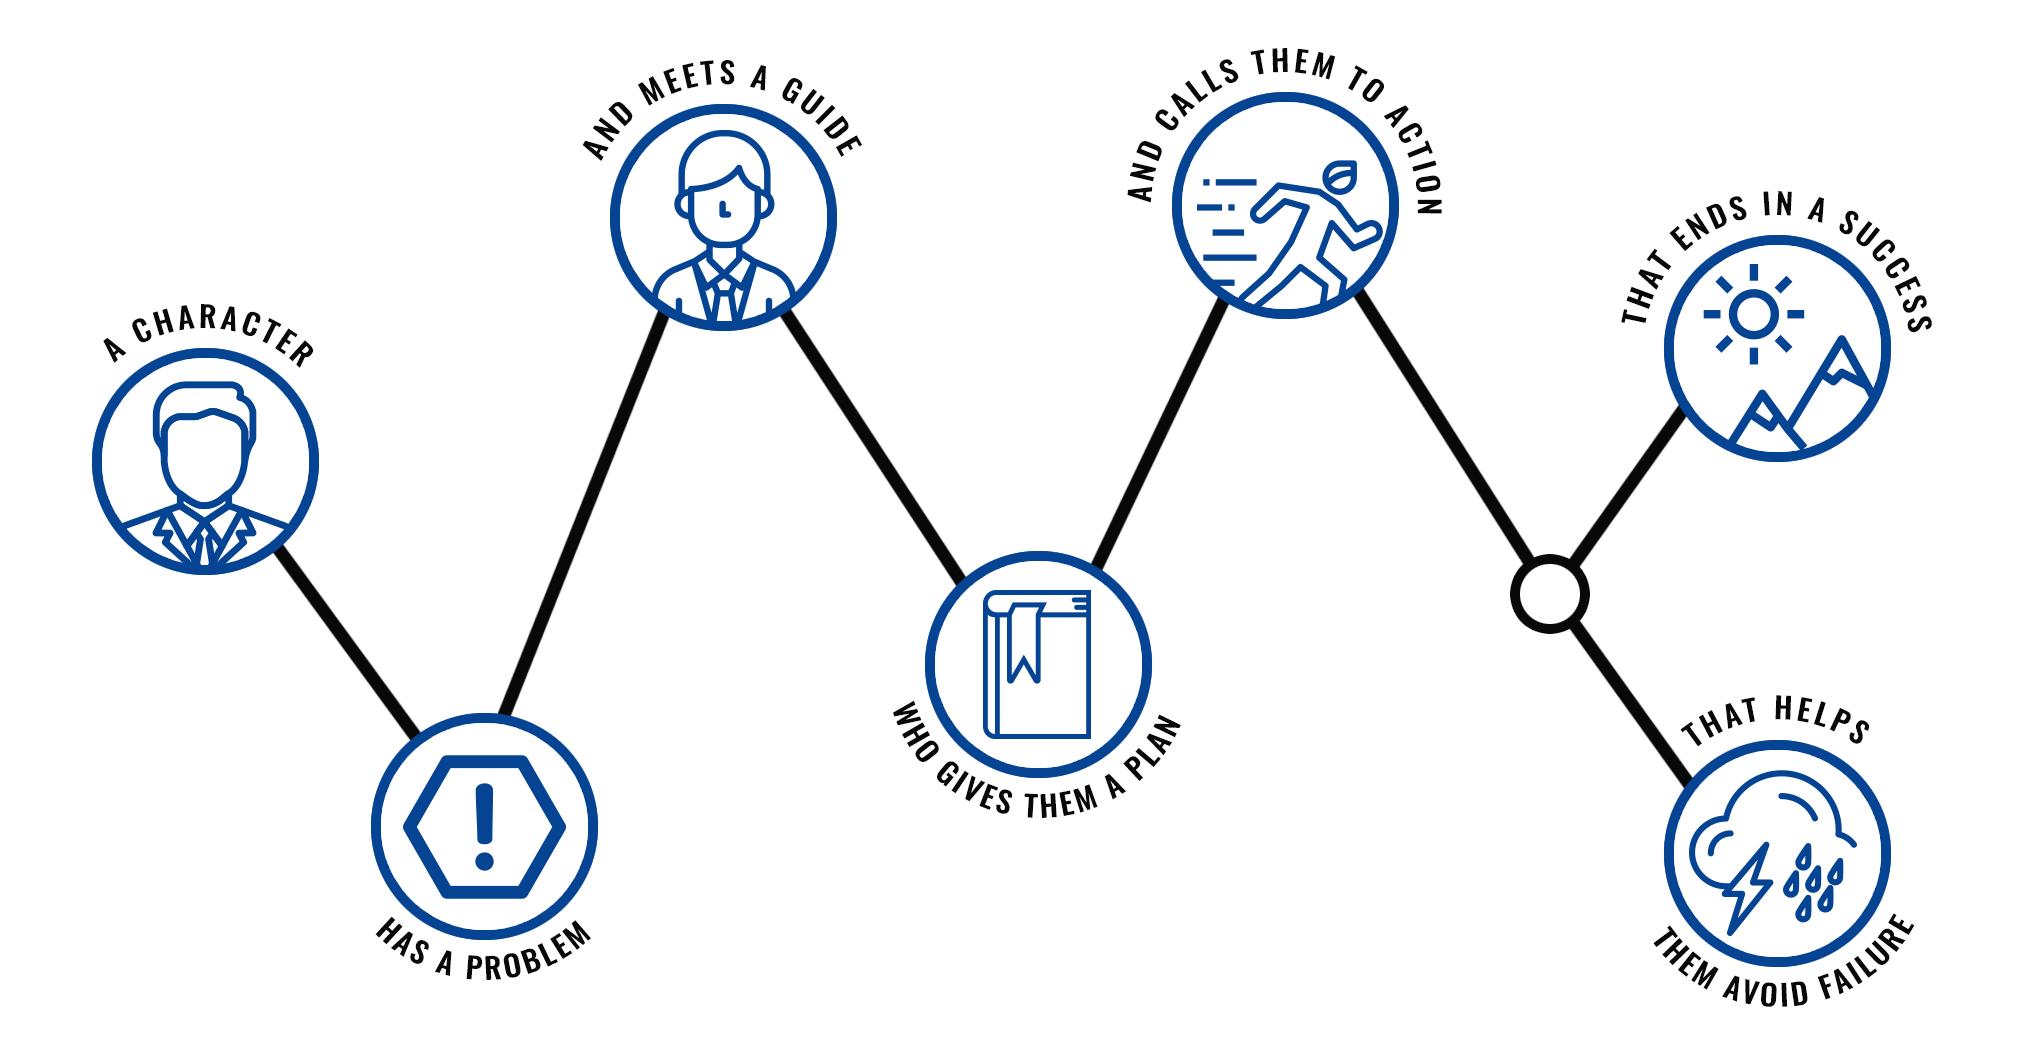 The StoryBrand Framework